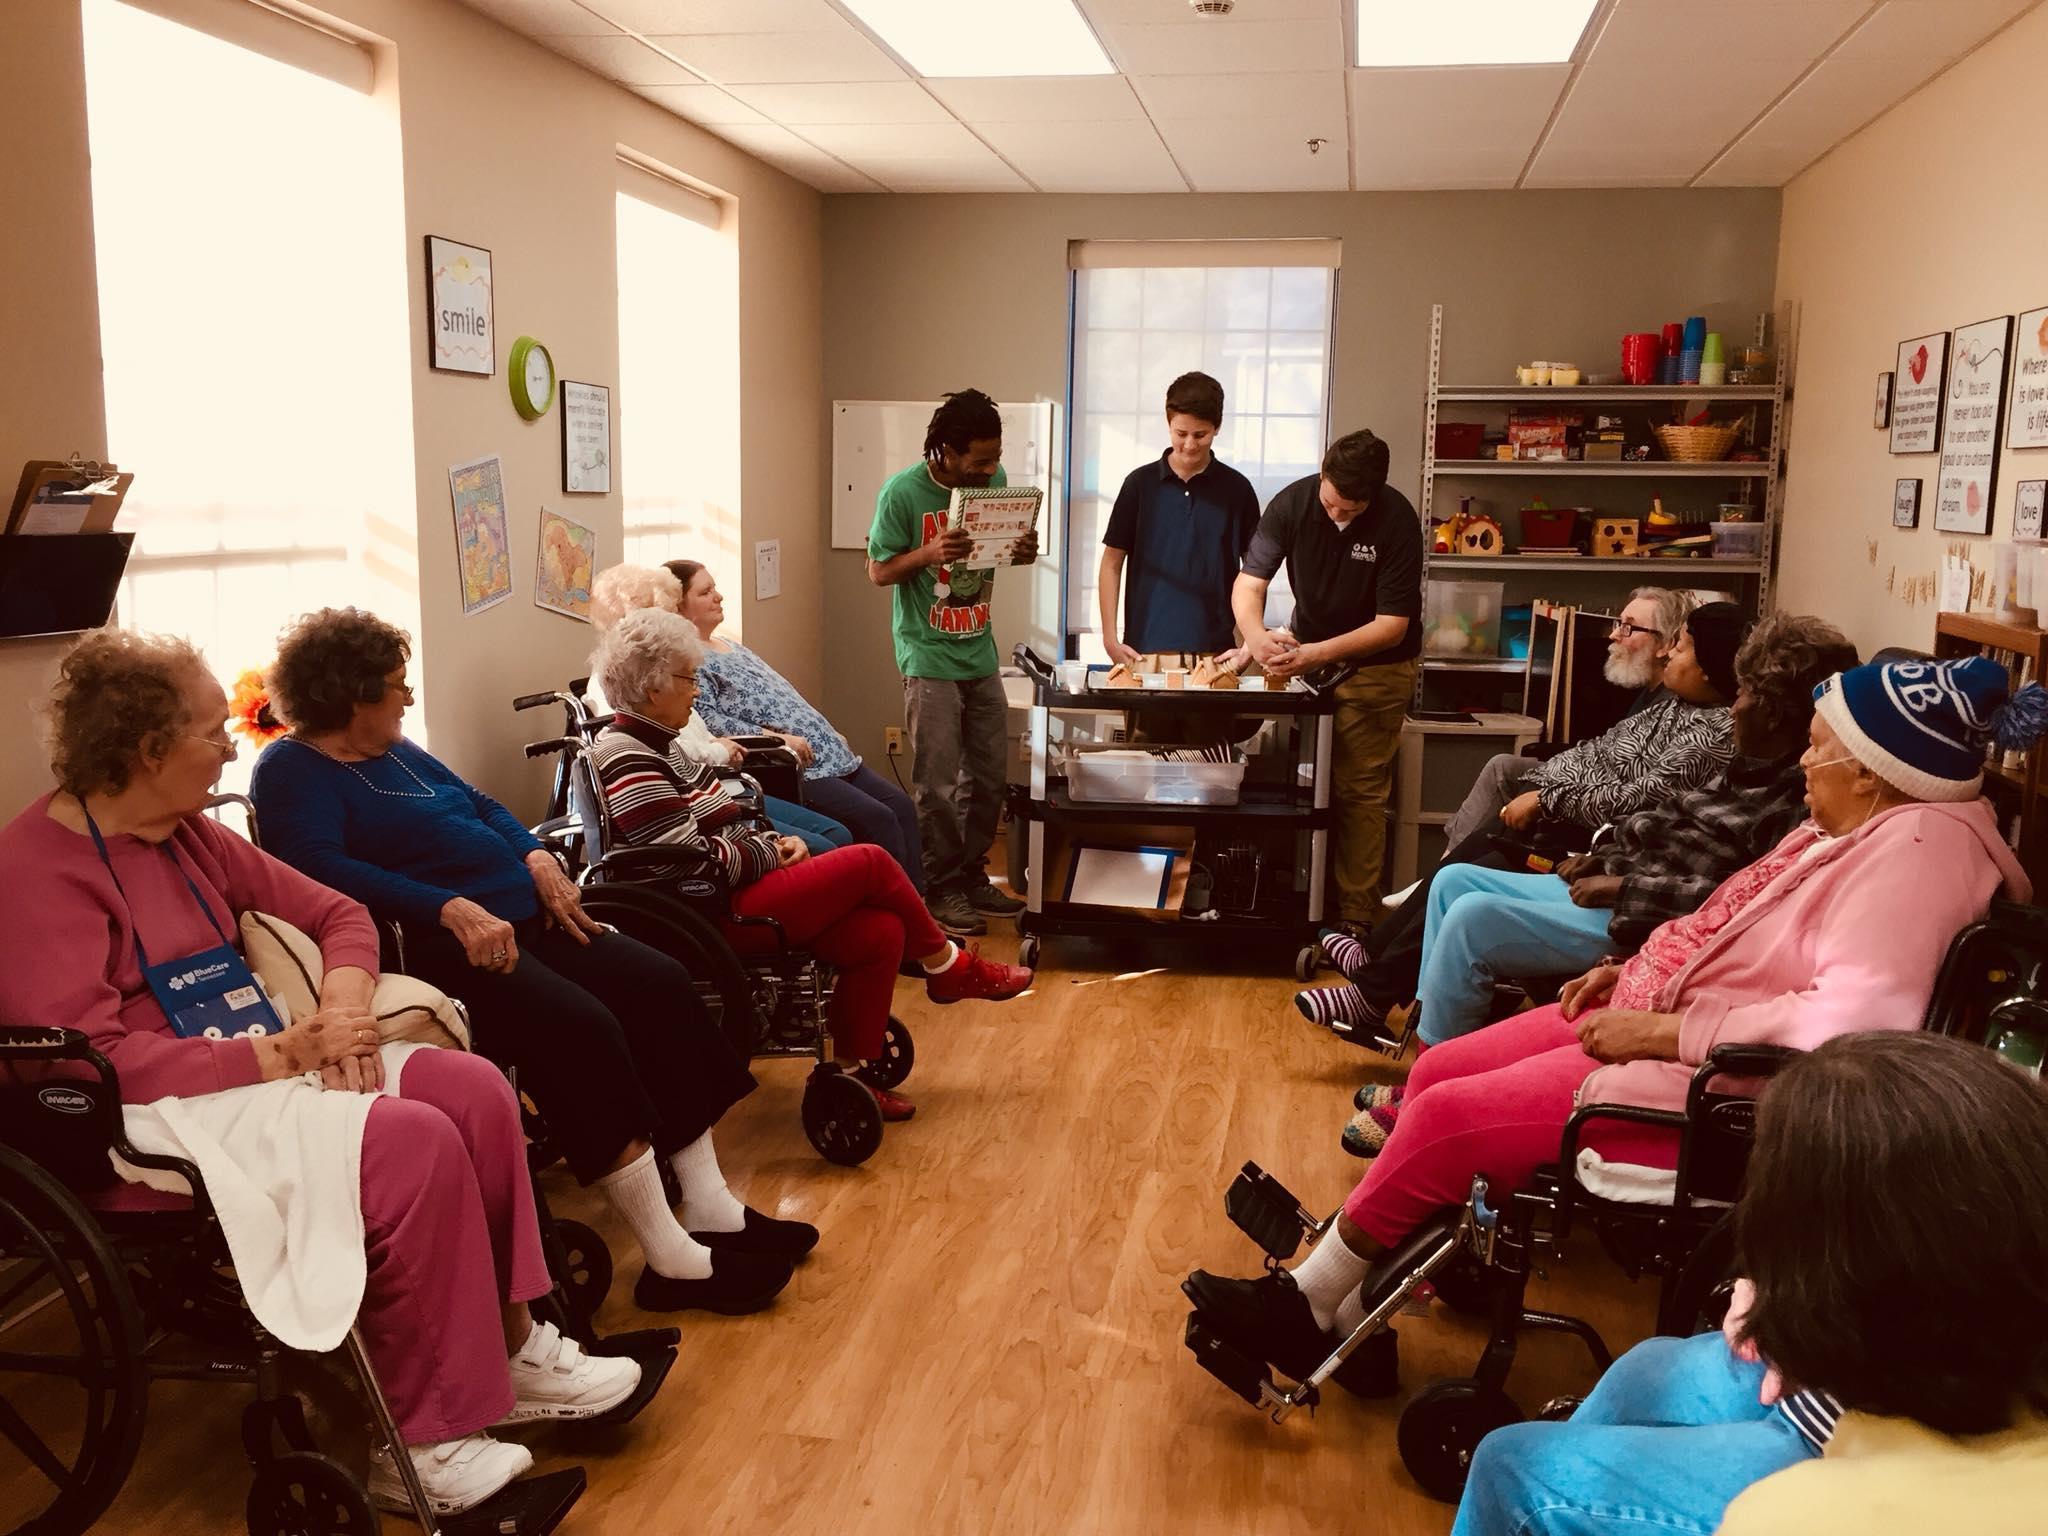 Maplewood Healthcare Center image 2